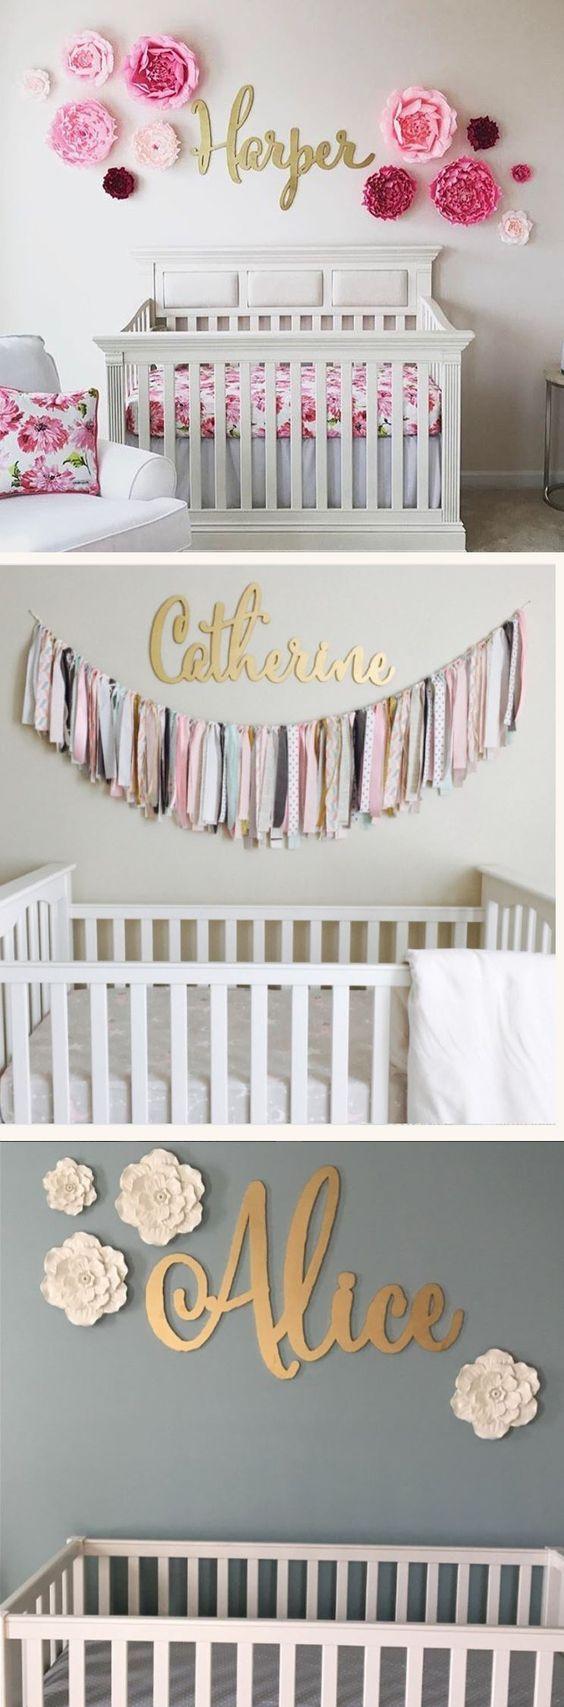 Best Baby Girl Rooms Ideas On Pinterest Baby Nursery Ideas - Decorating nursery room for baby girl